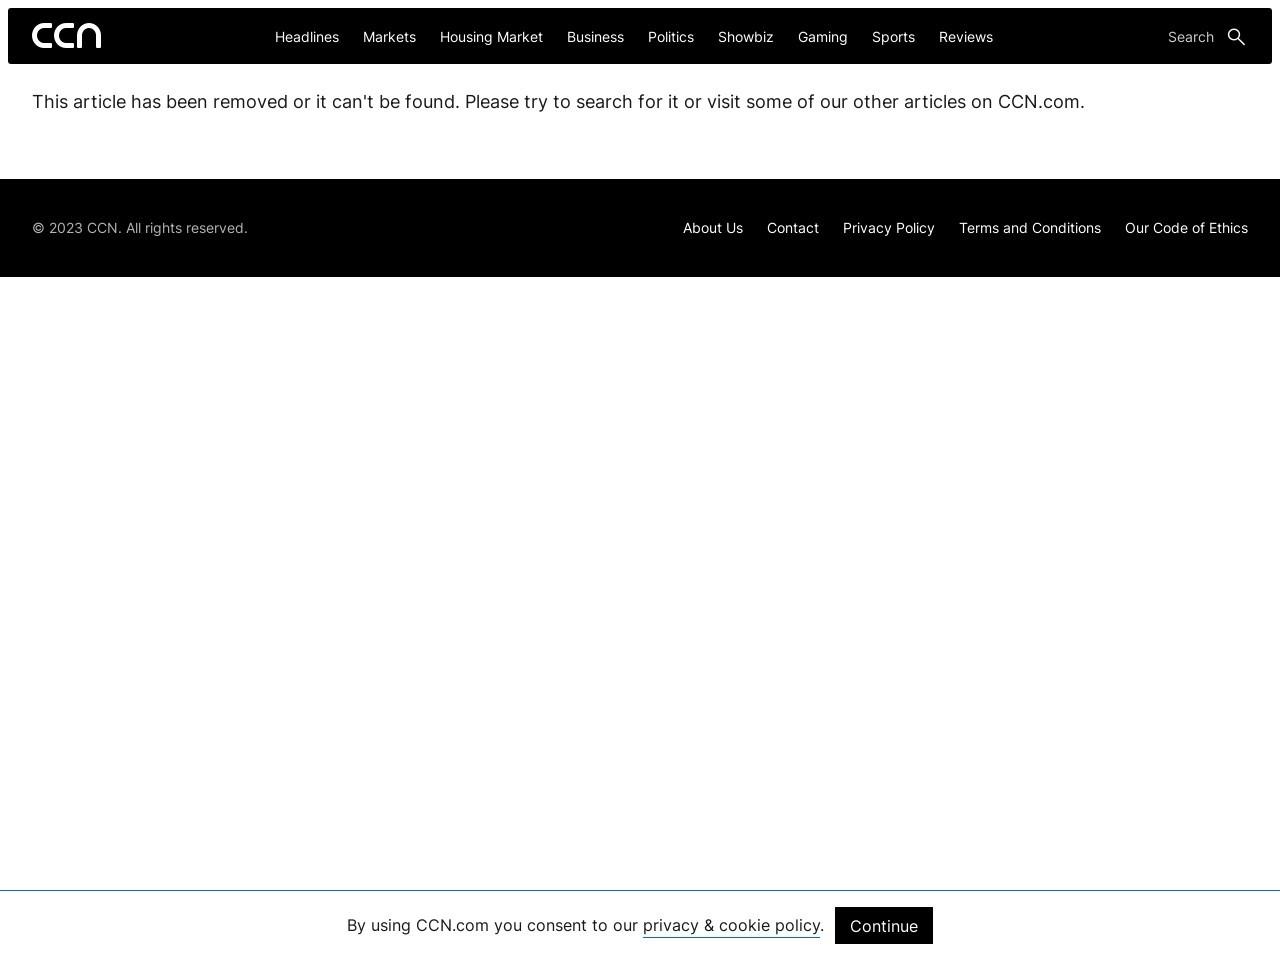 Bitcoin Analysis: Falling Wedge Indicates Interim Breakout Scenario